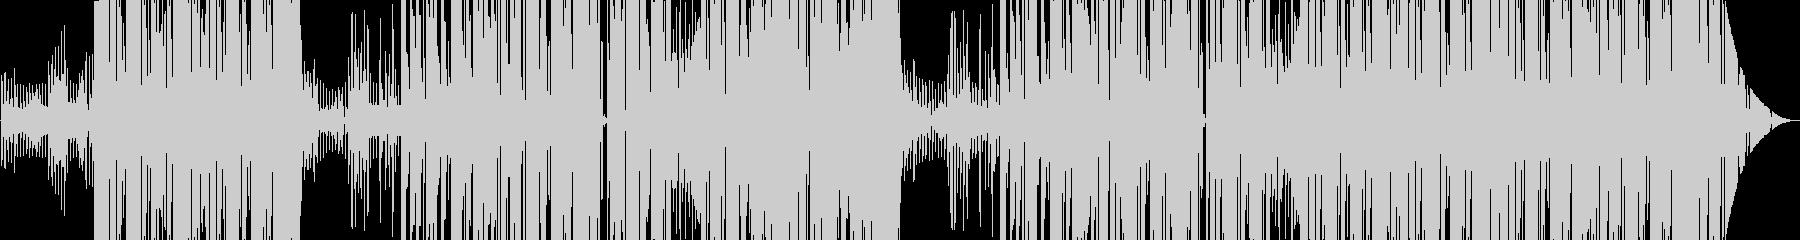 Trap 宇宙っぽいウワモノが印象的の未再生の波形